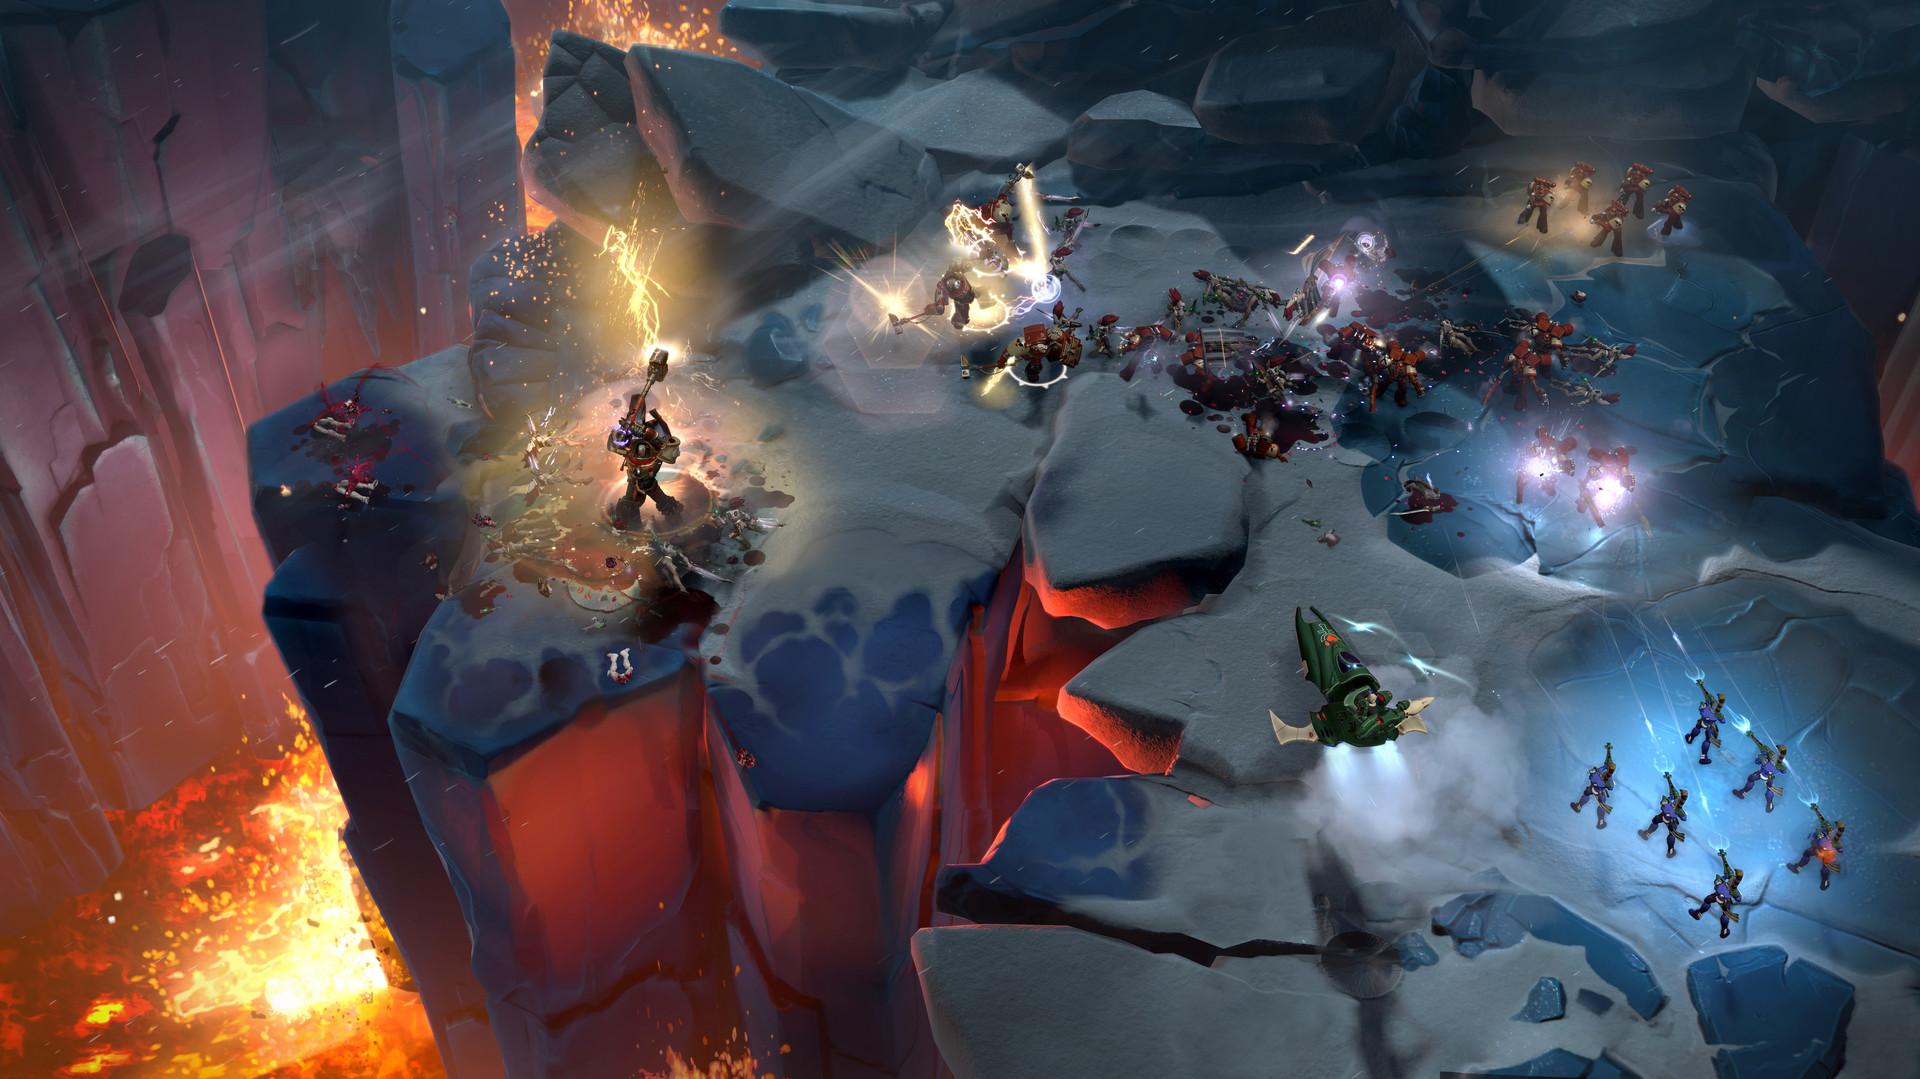 dawn of war 3 download